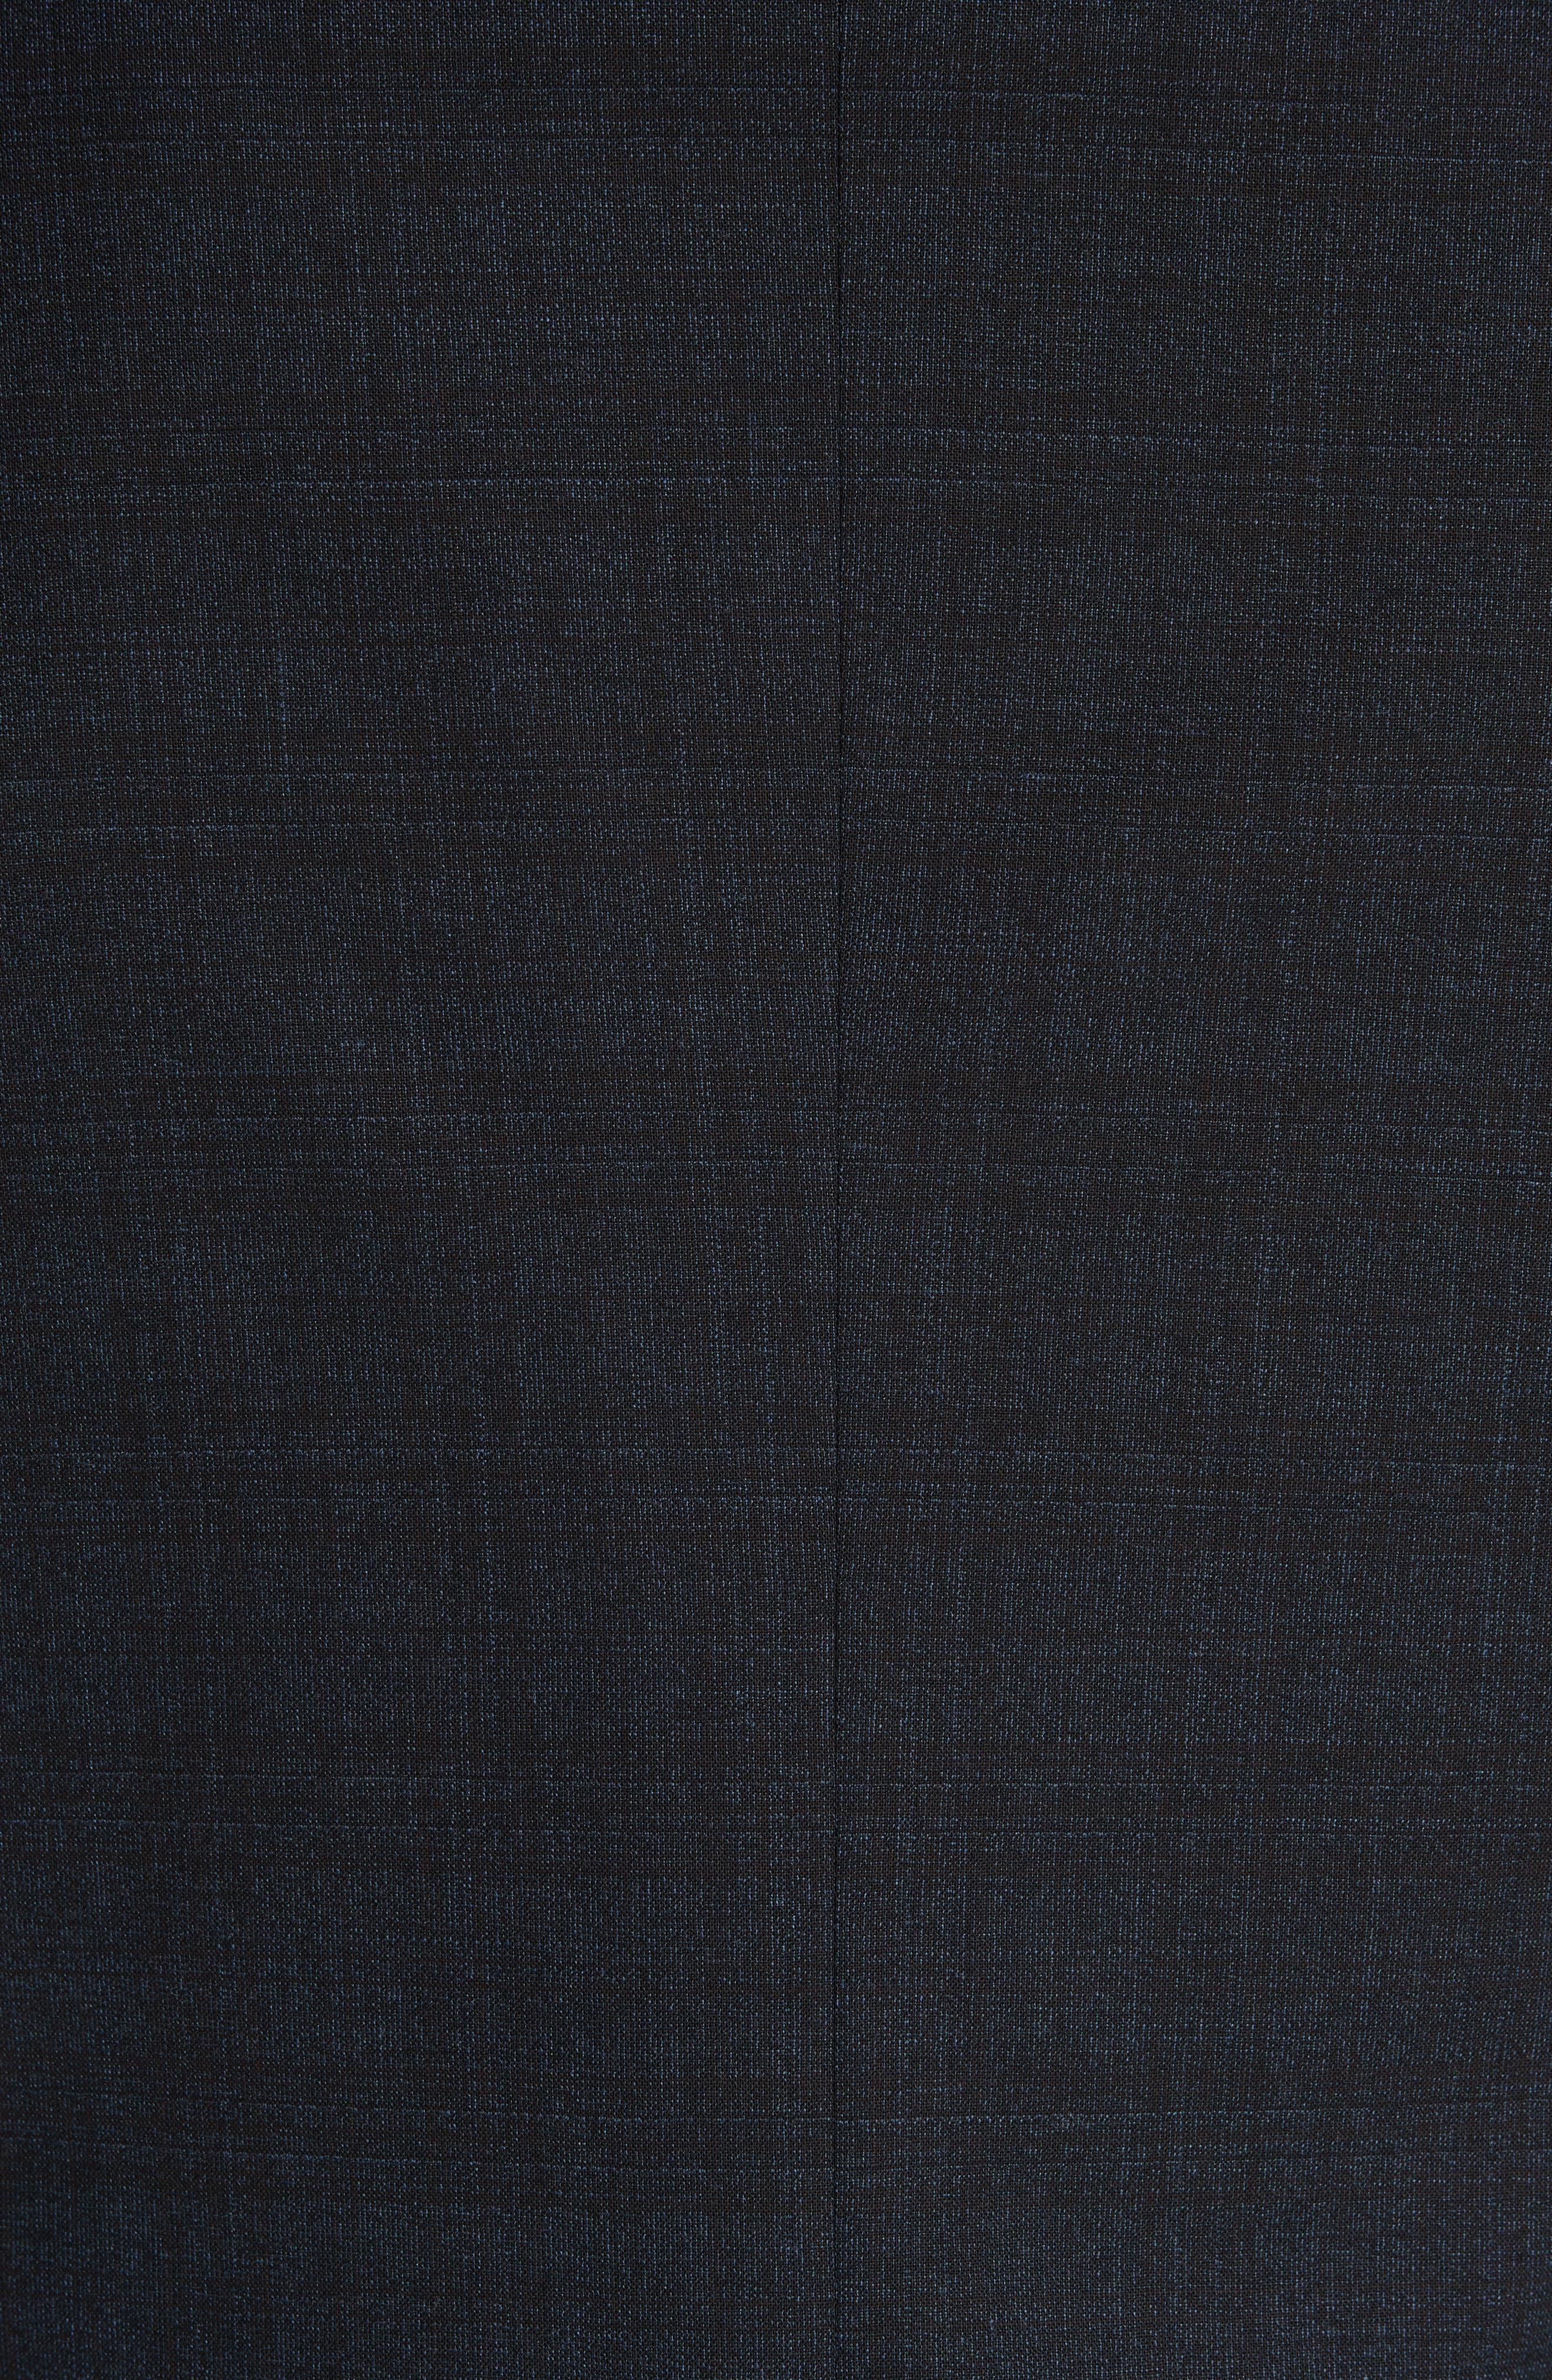 G-Line Trim Fit Stretch Plaid Wool Suit,                             Alternate thumbnail 7, color,                             NAVY/ BROWN